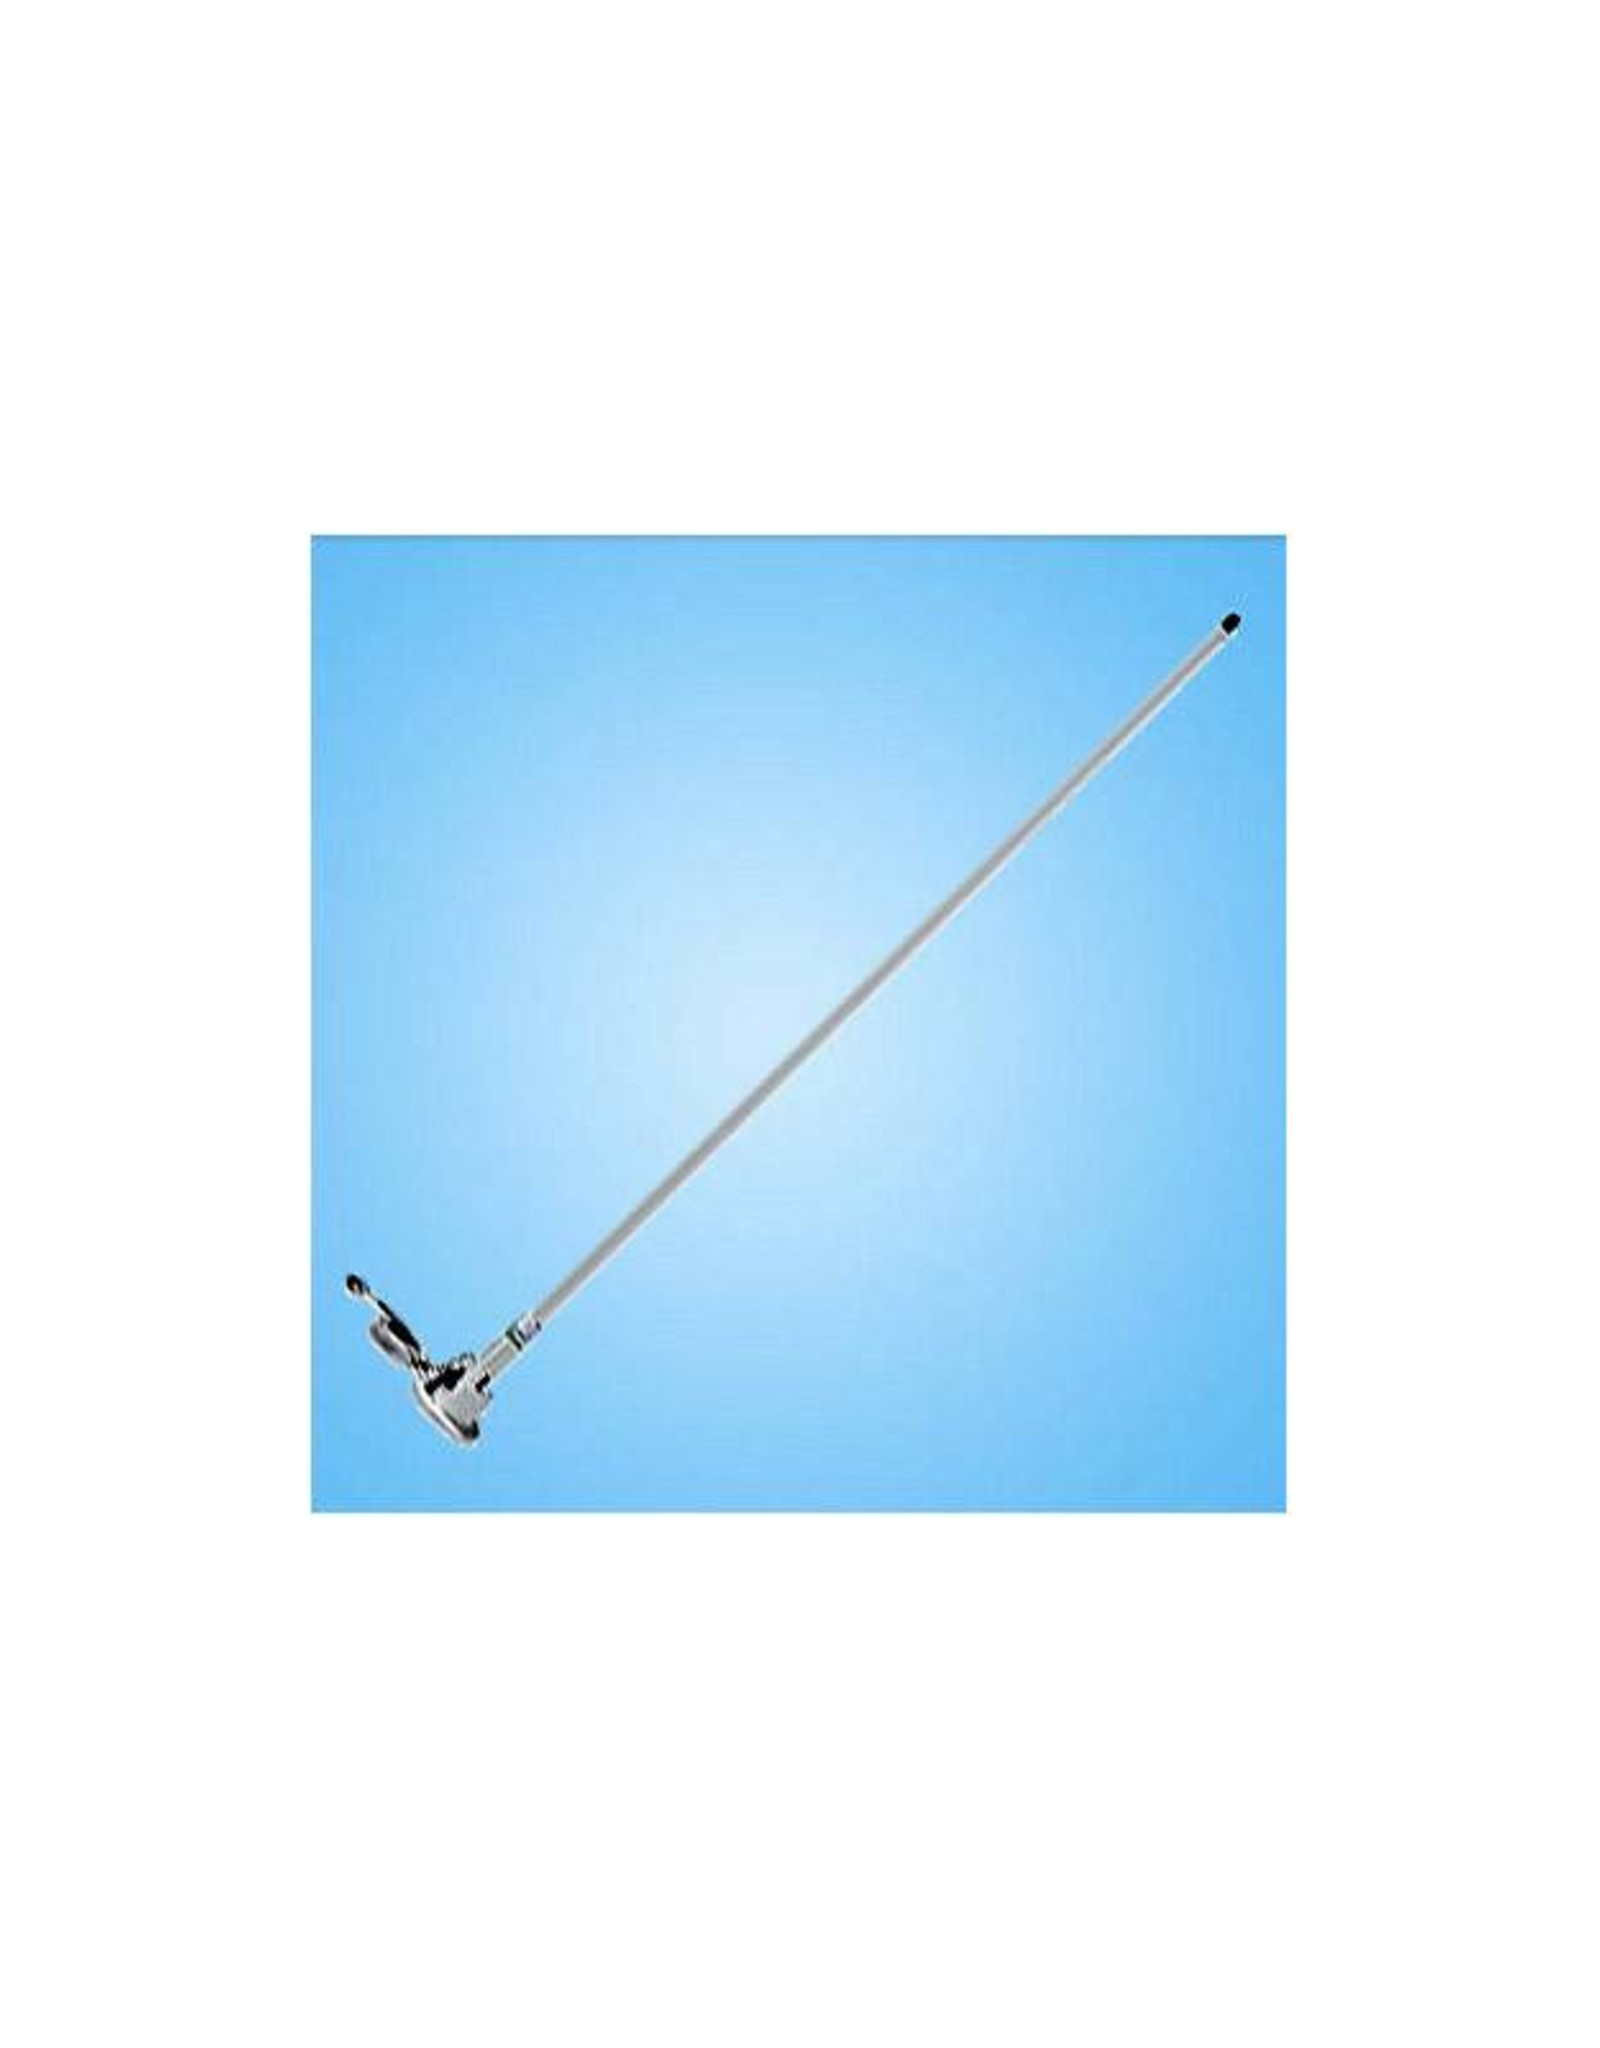 5'VHF DECK MOUNT ANTENNA 420